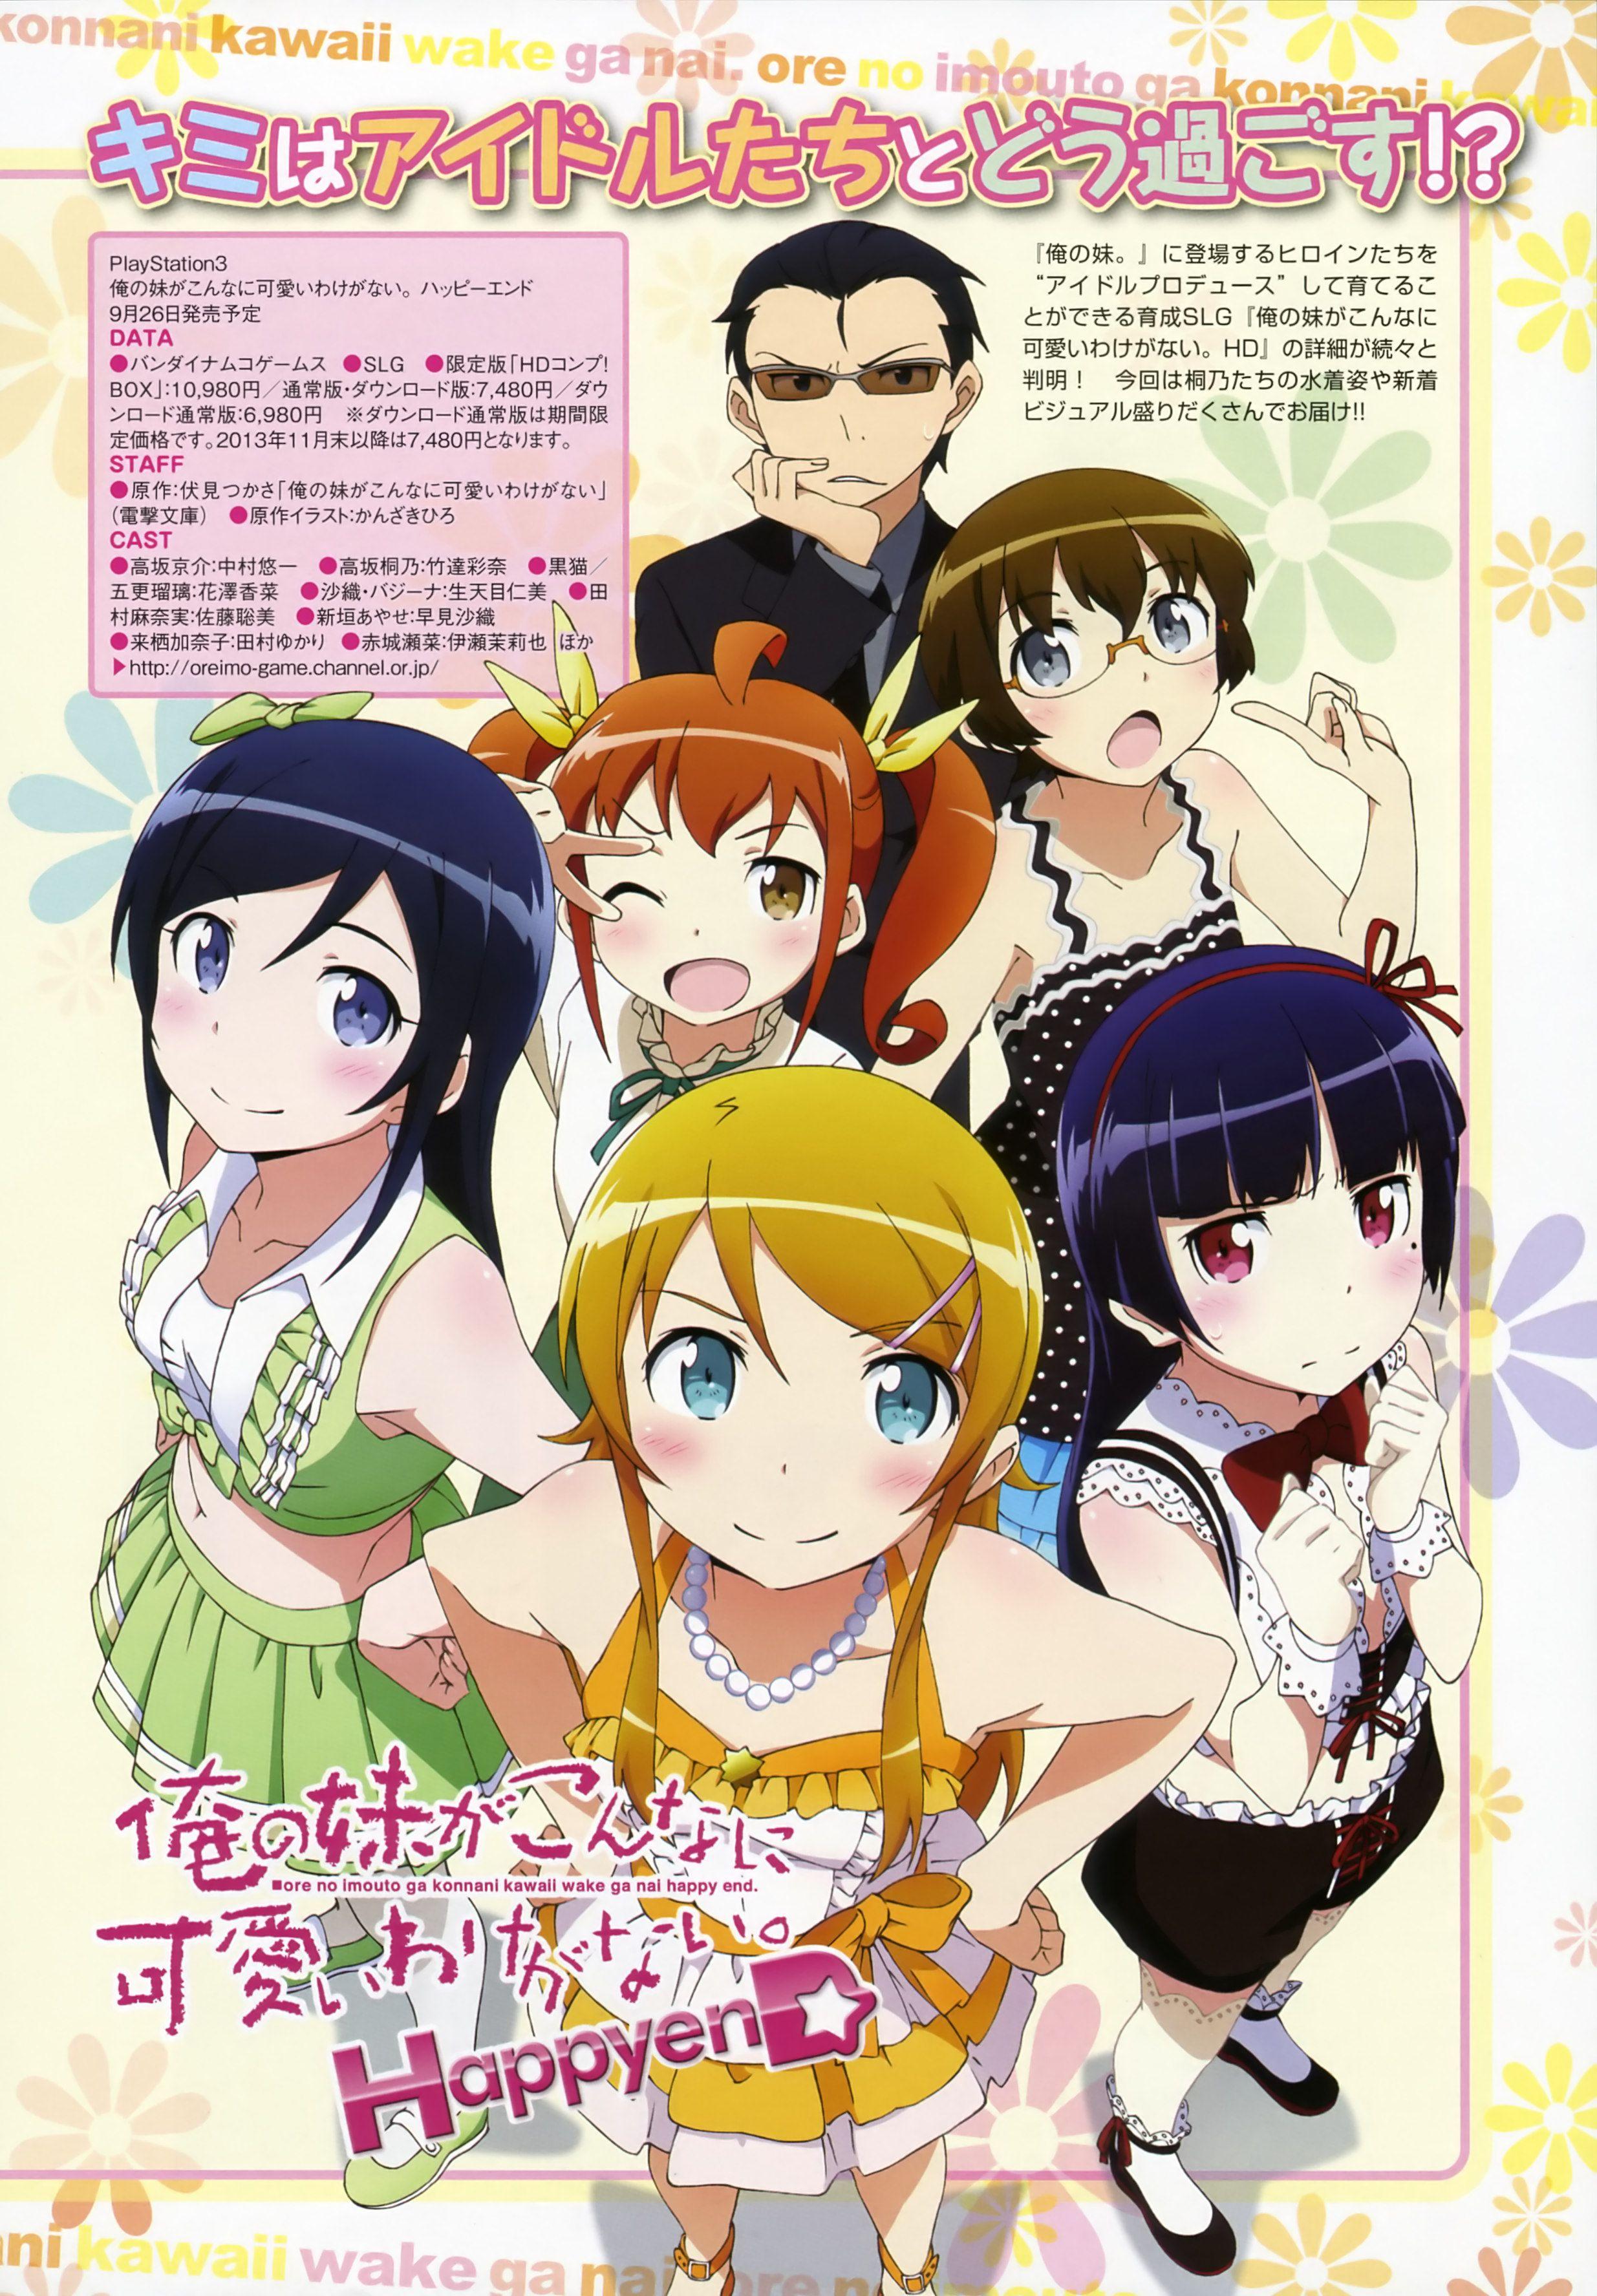 Wallpaper : illustration, anime girls, cartoon, Ore no